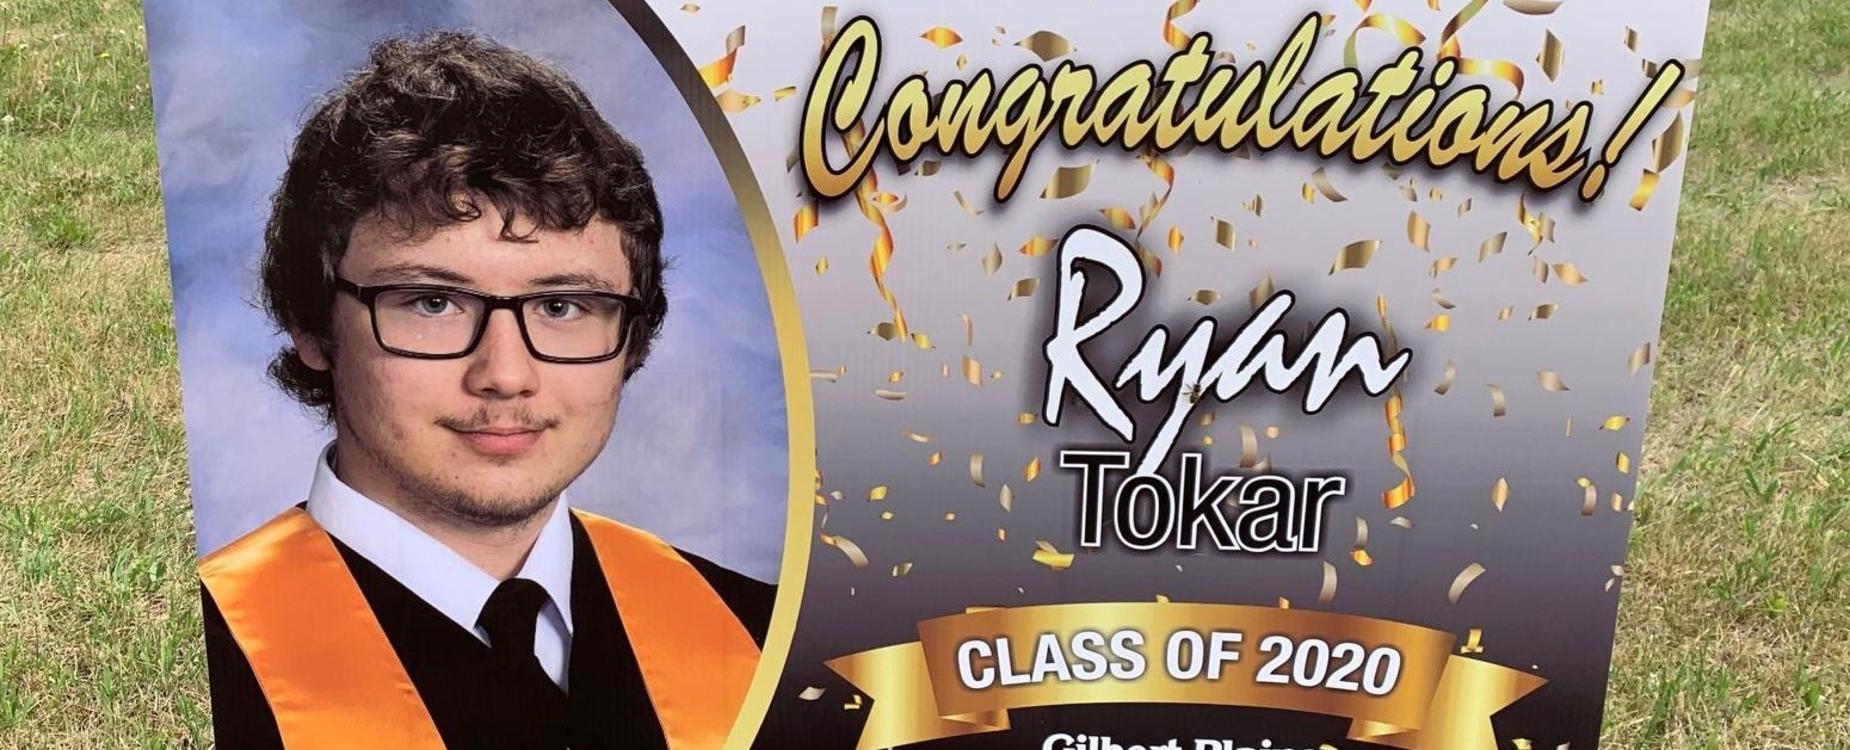 Ryan Tokar